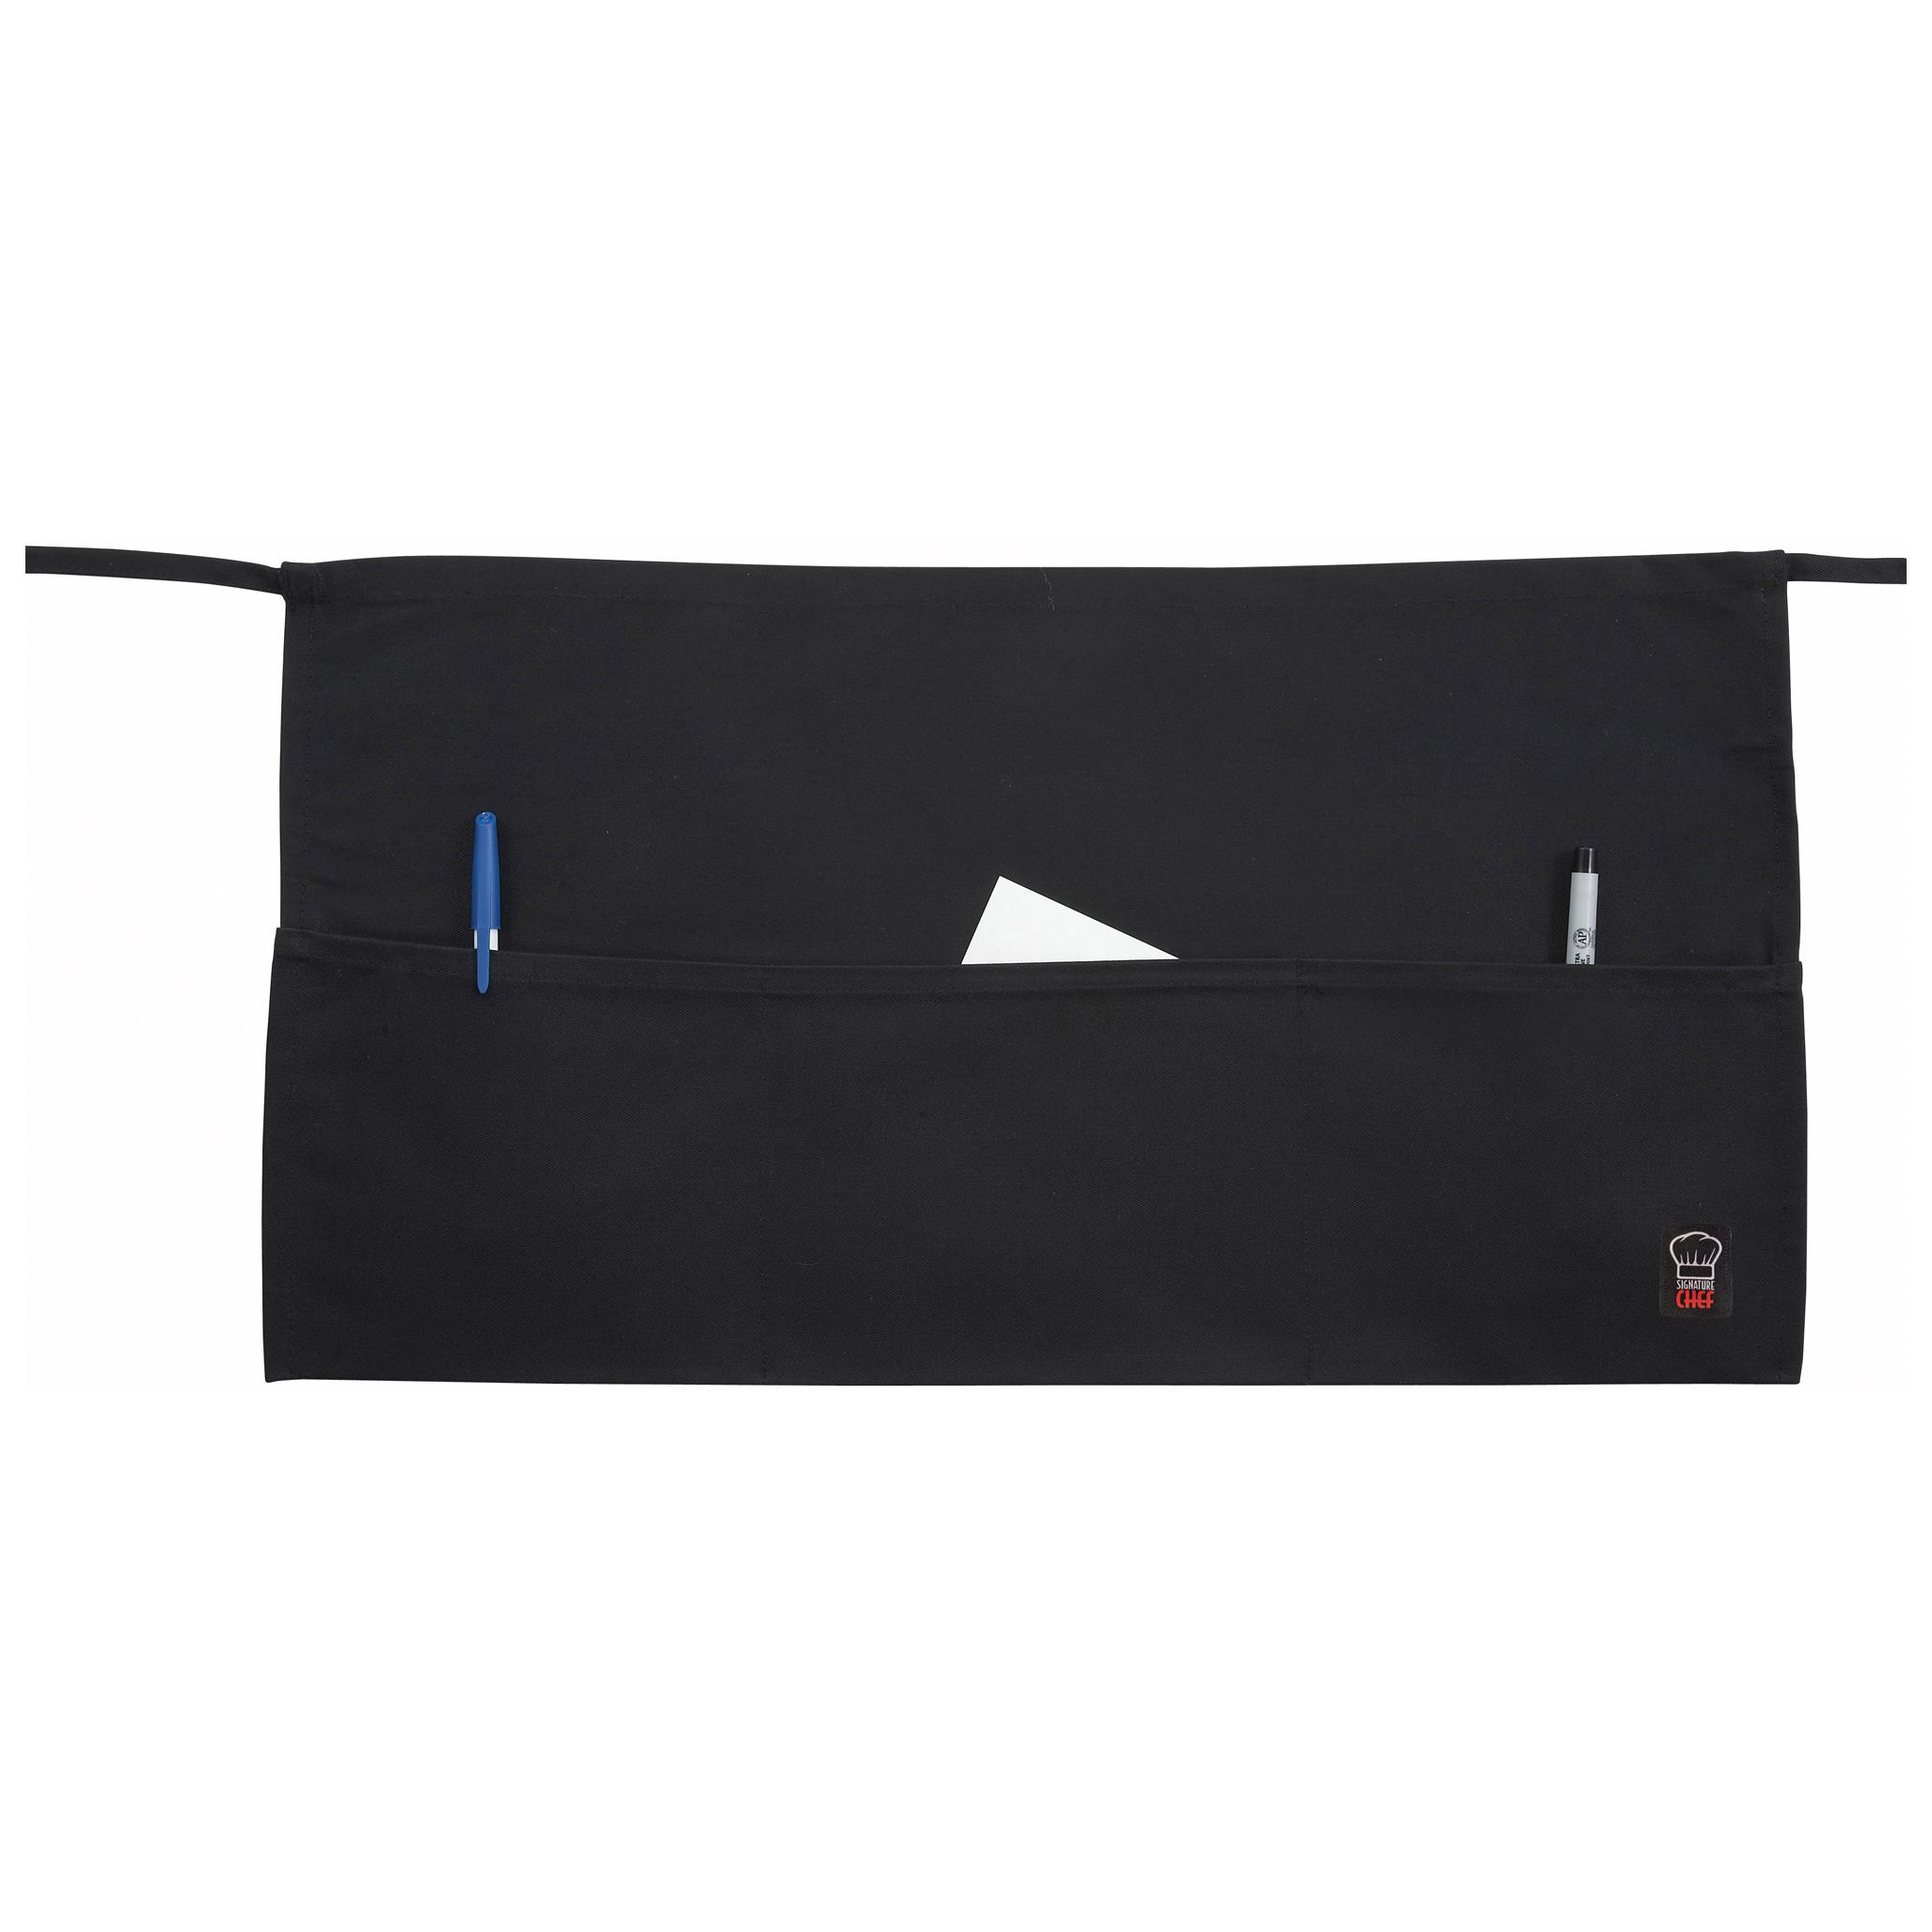 Winco WA-1221 waist apron